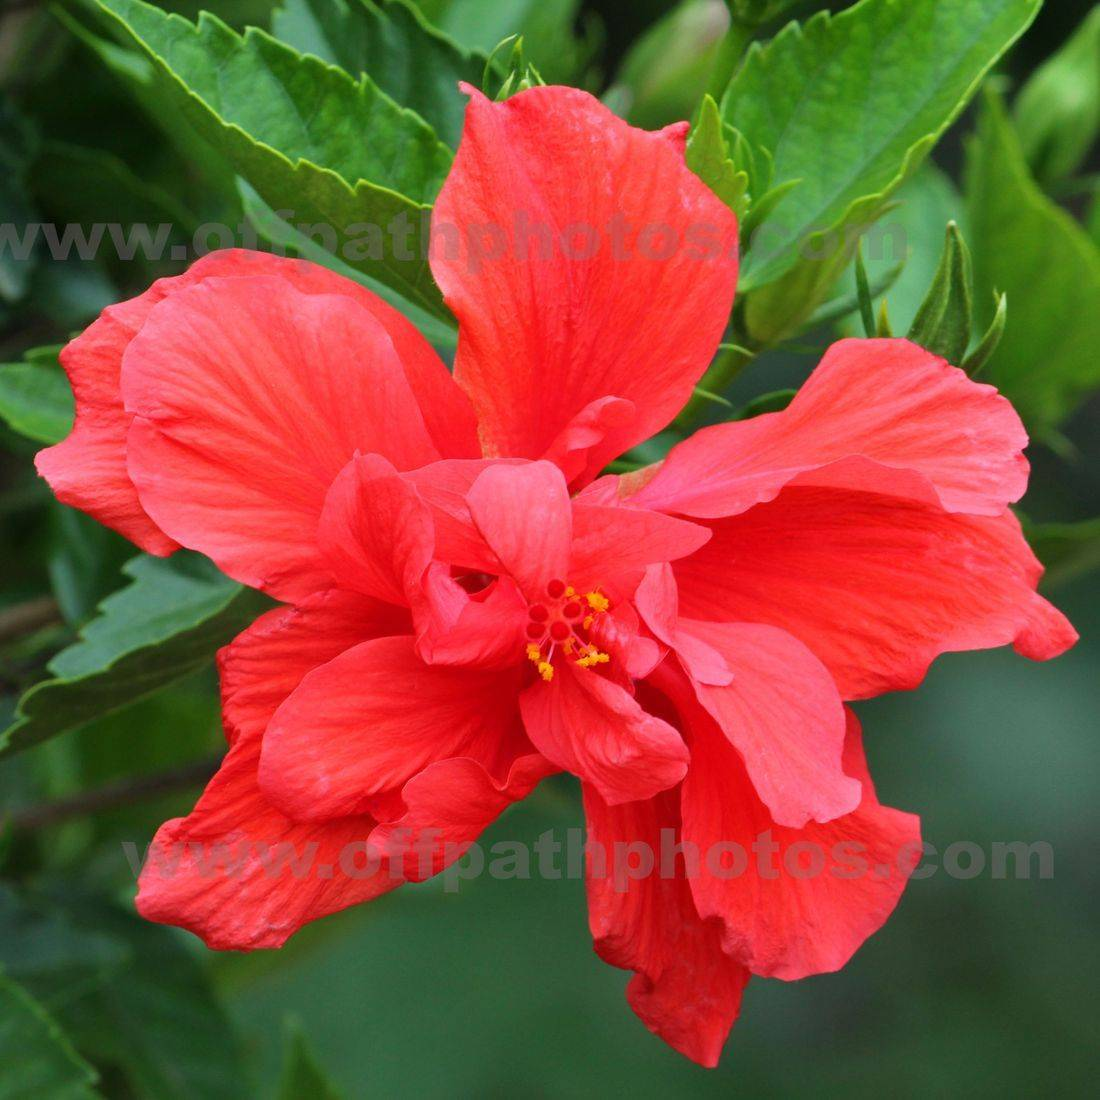 photography, nature, garden, flowers, scripture, God, Isaiah, hydrangeas, summer, promises